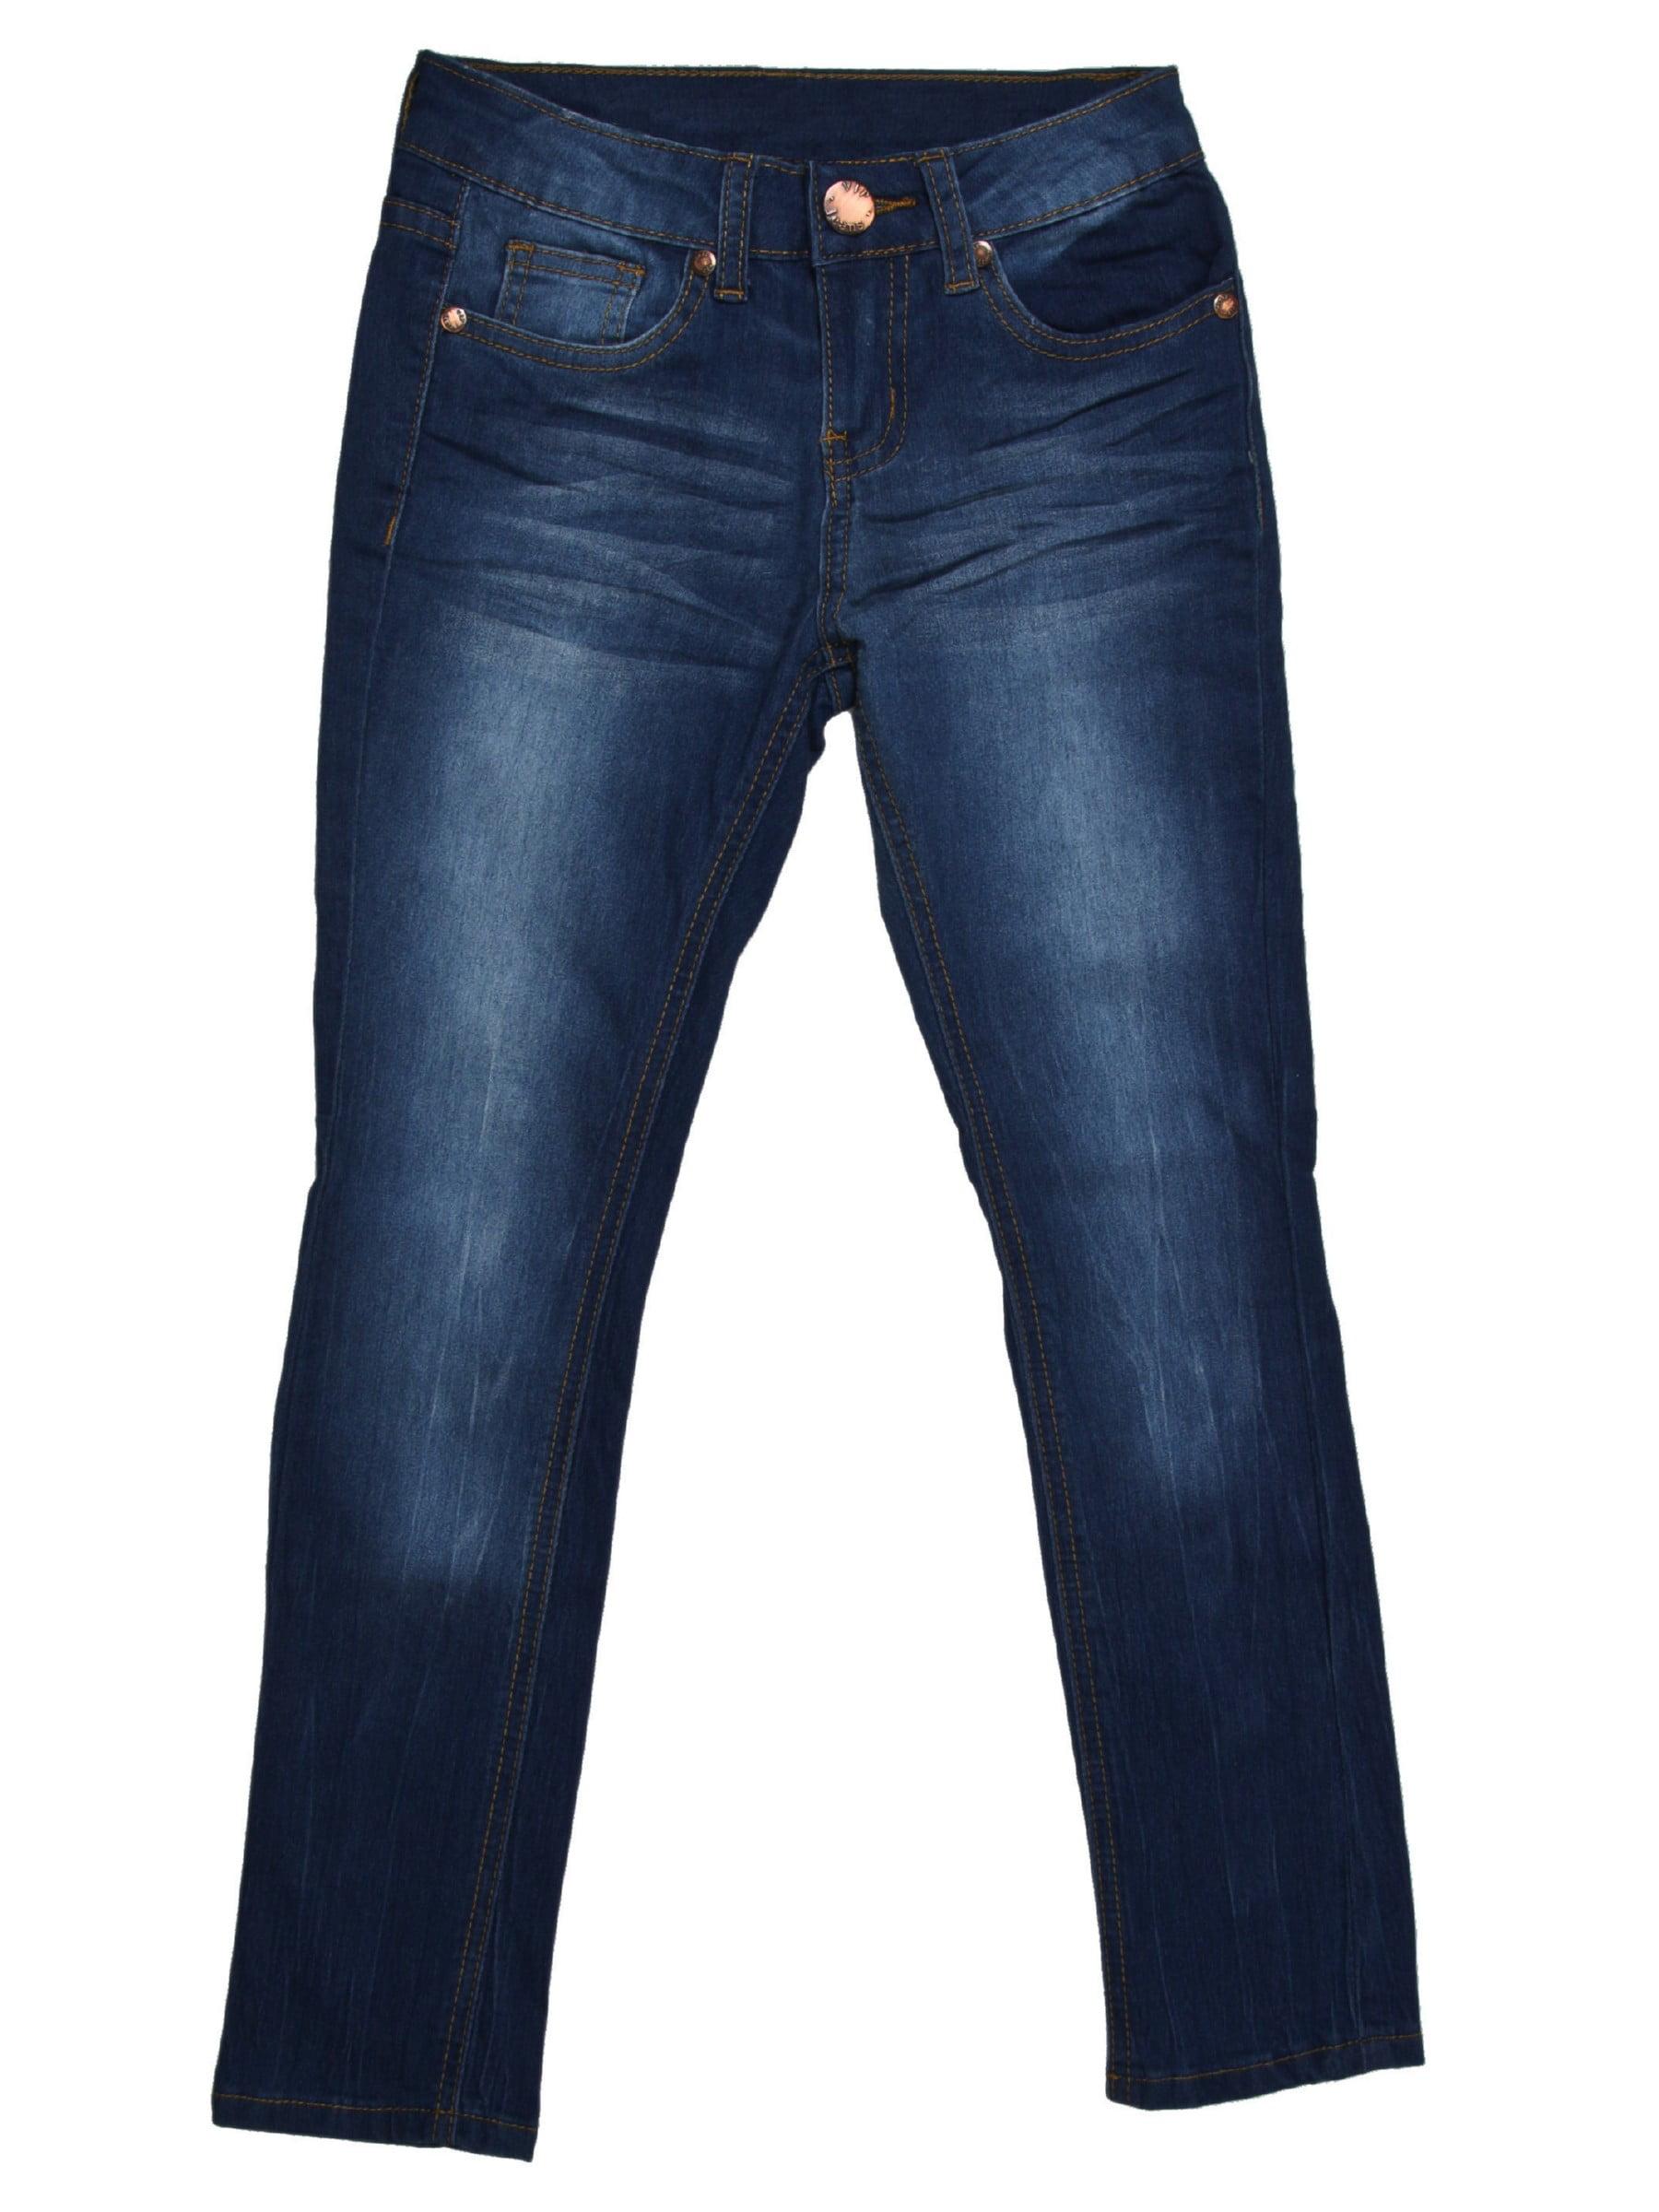 Girls Kids Stretch Pockets Skinny Denim Jeans Or Shorts (MLG1)